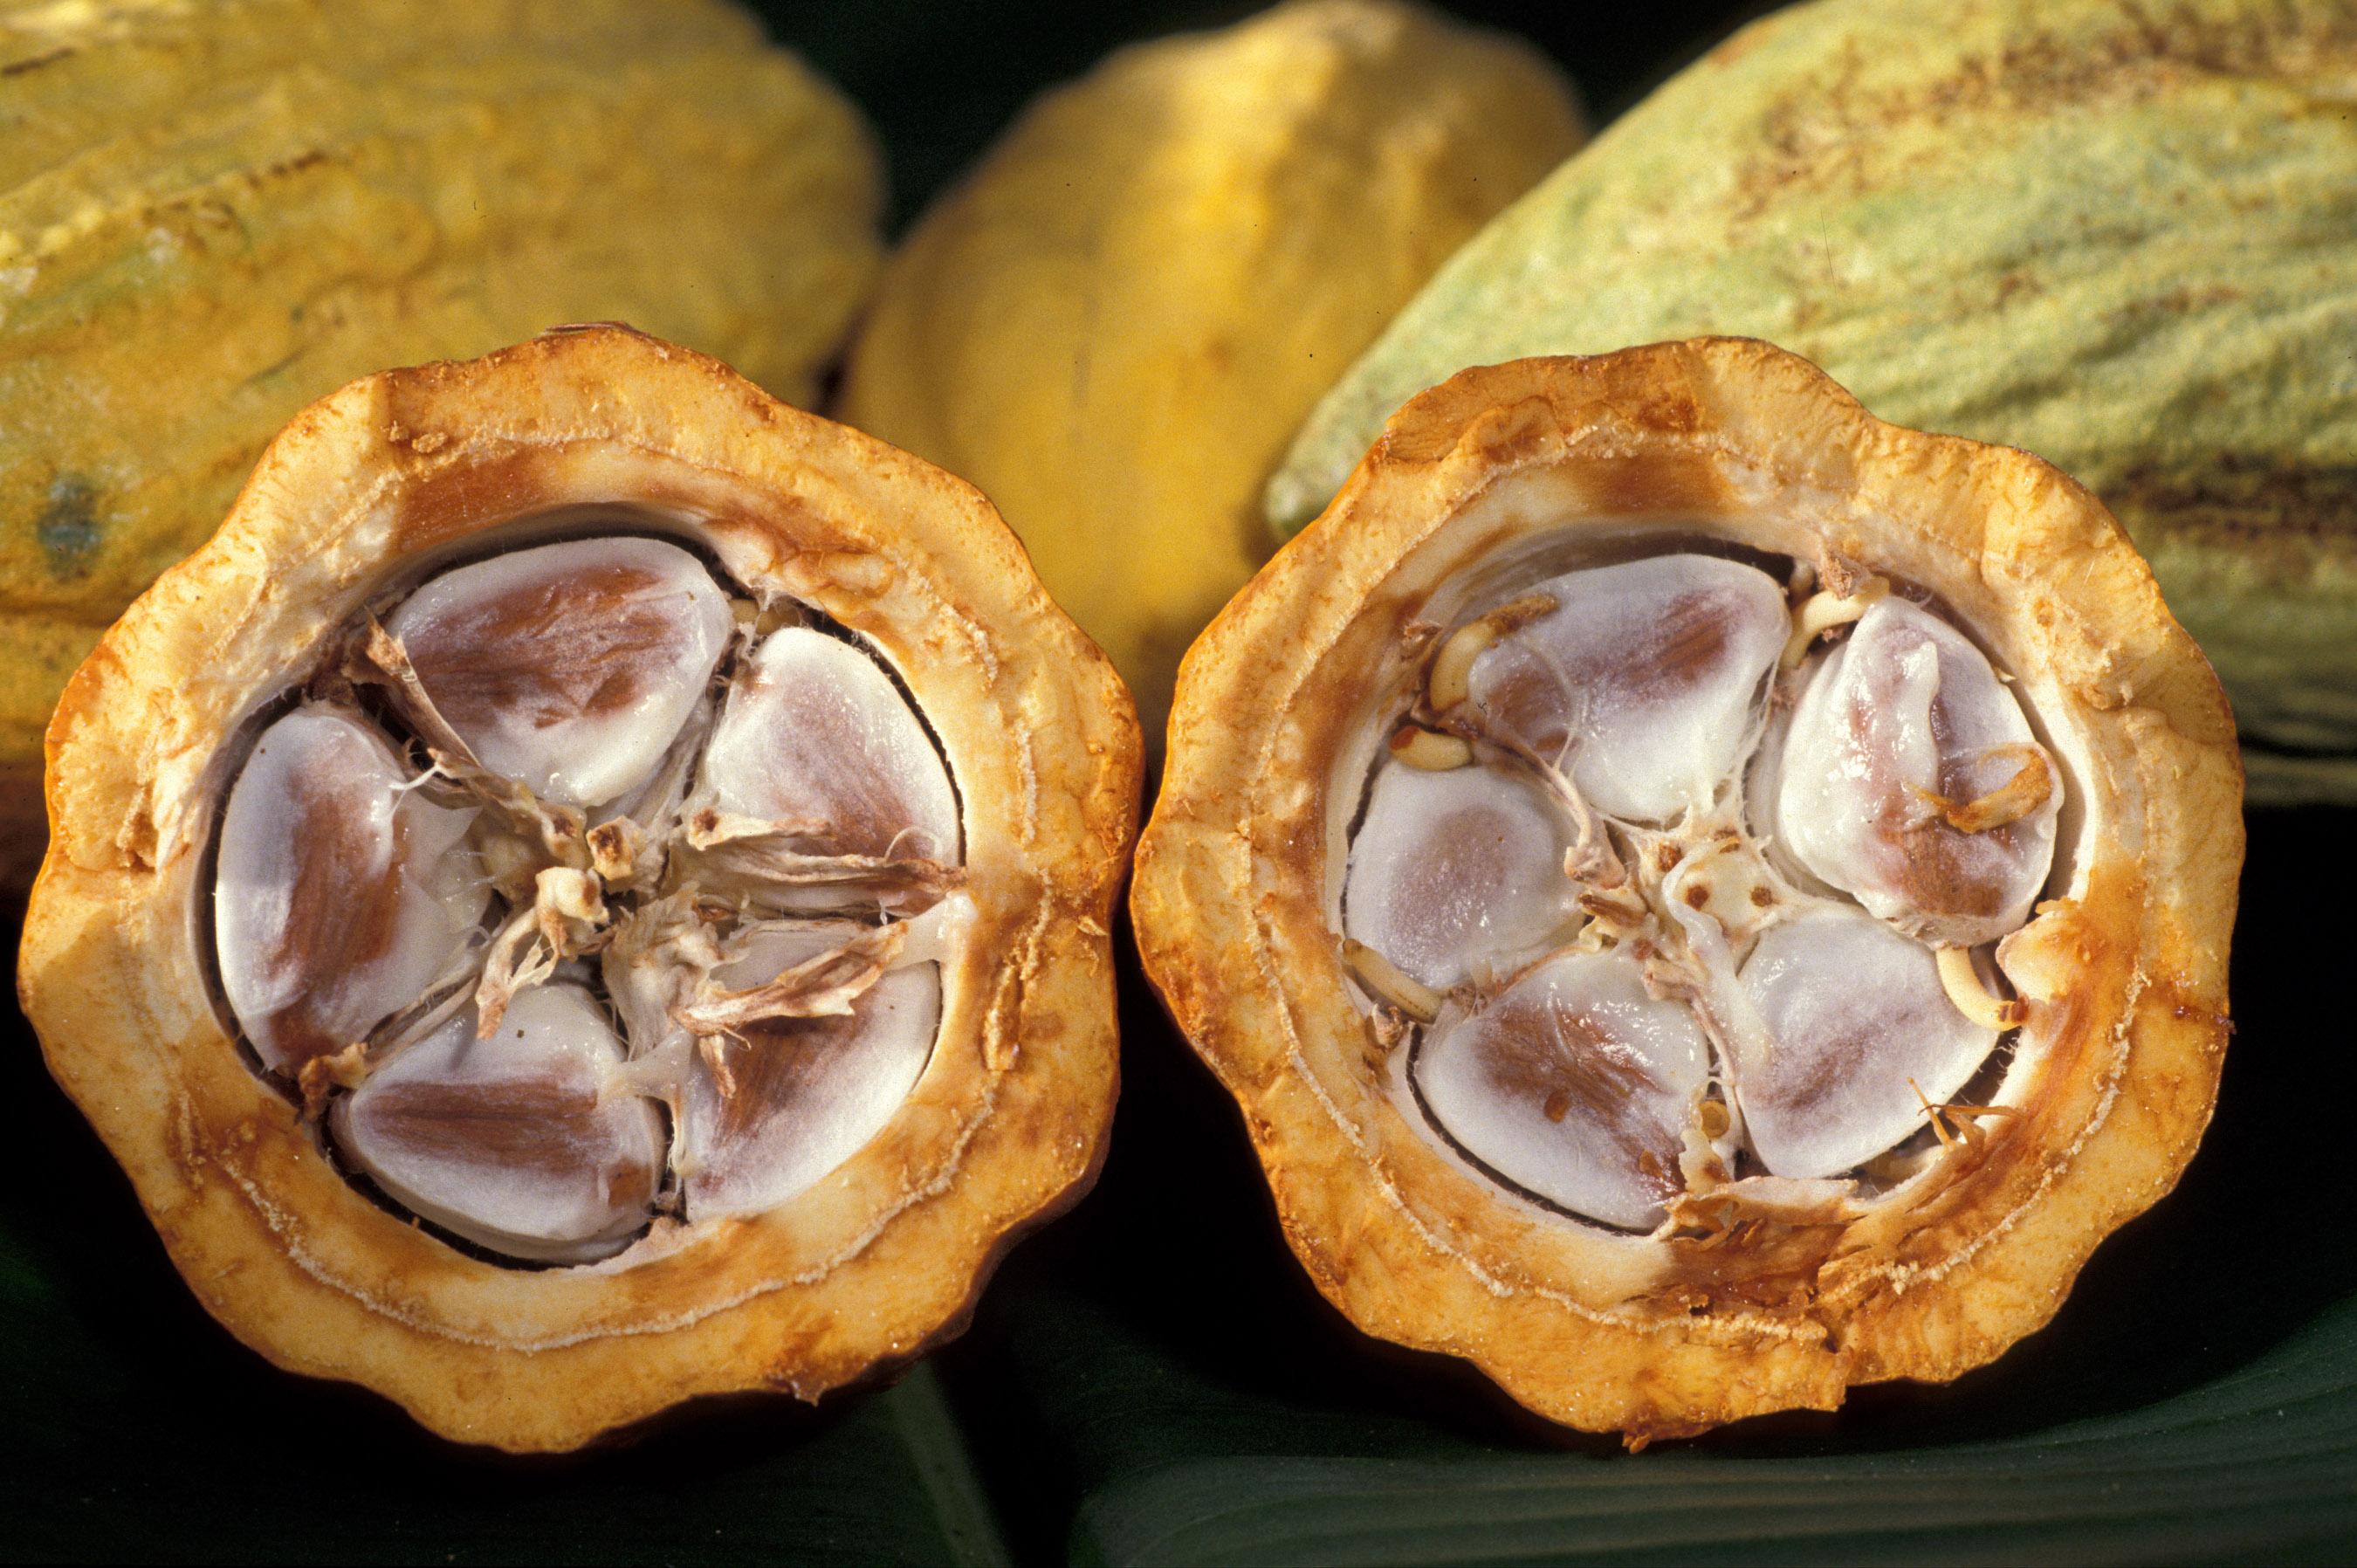 Cacao-pod-k4636-14-Keith Weller